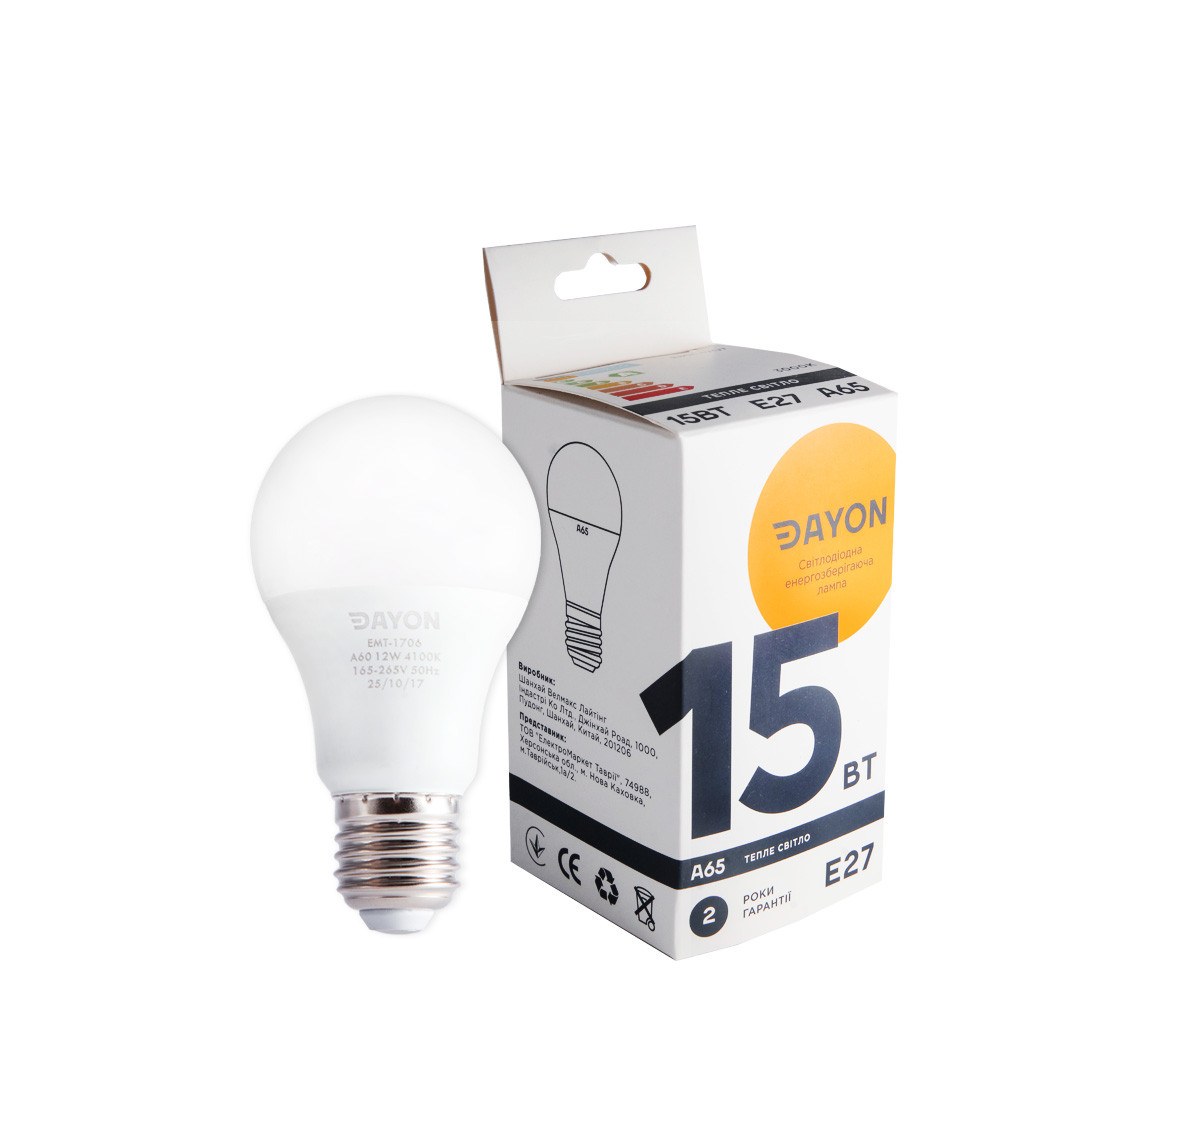 Светодиодная лампа DAYON EMT-1707 A65 15W 3000K E27